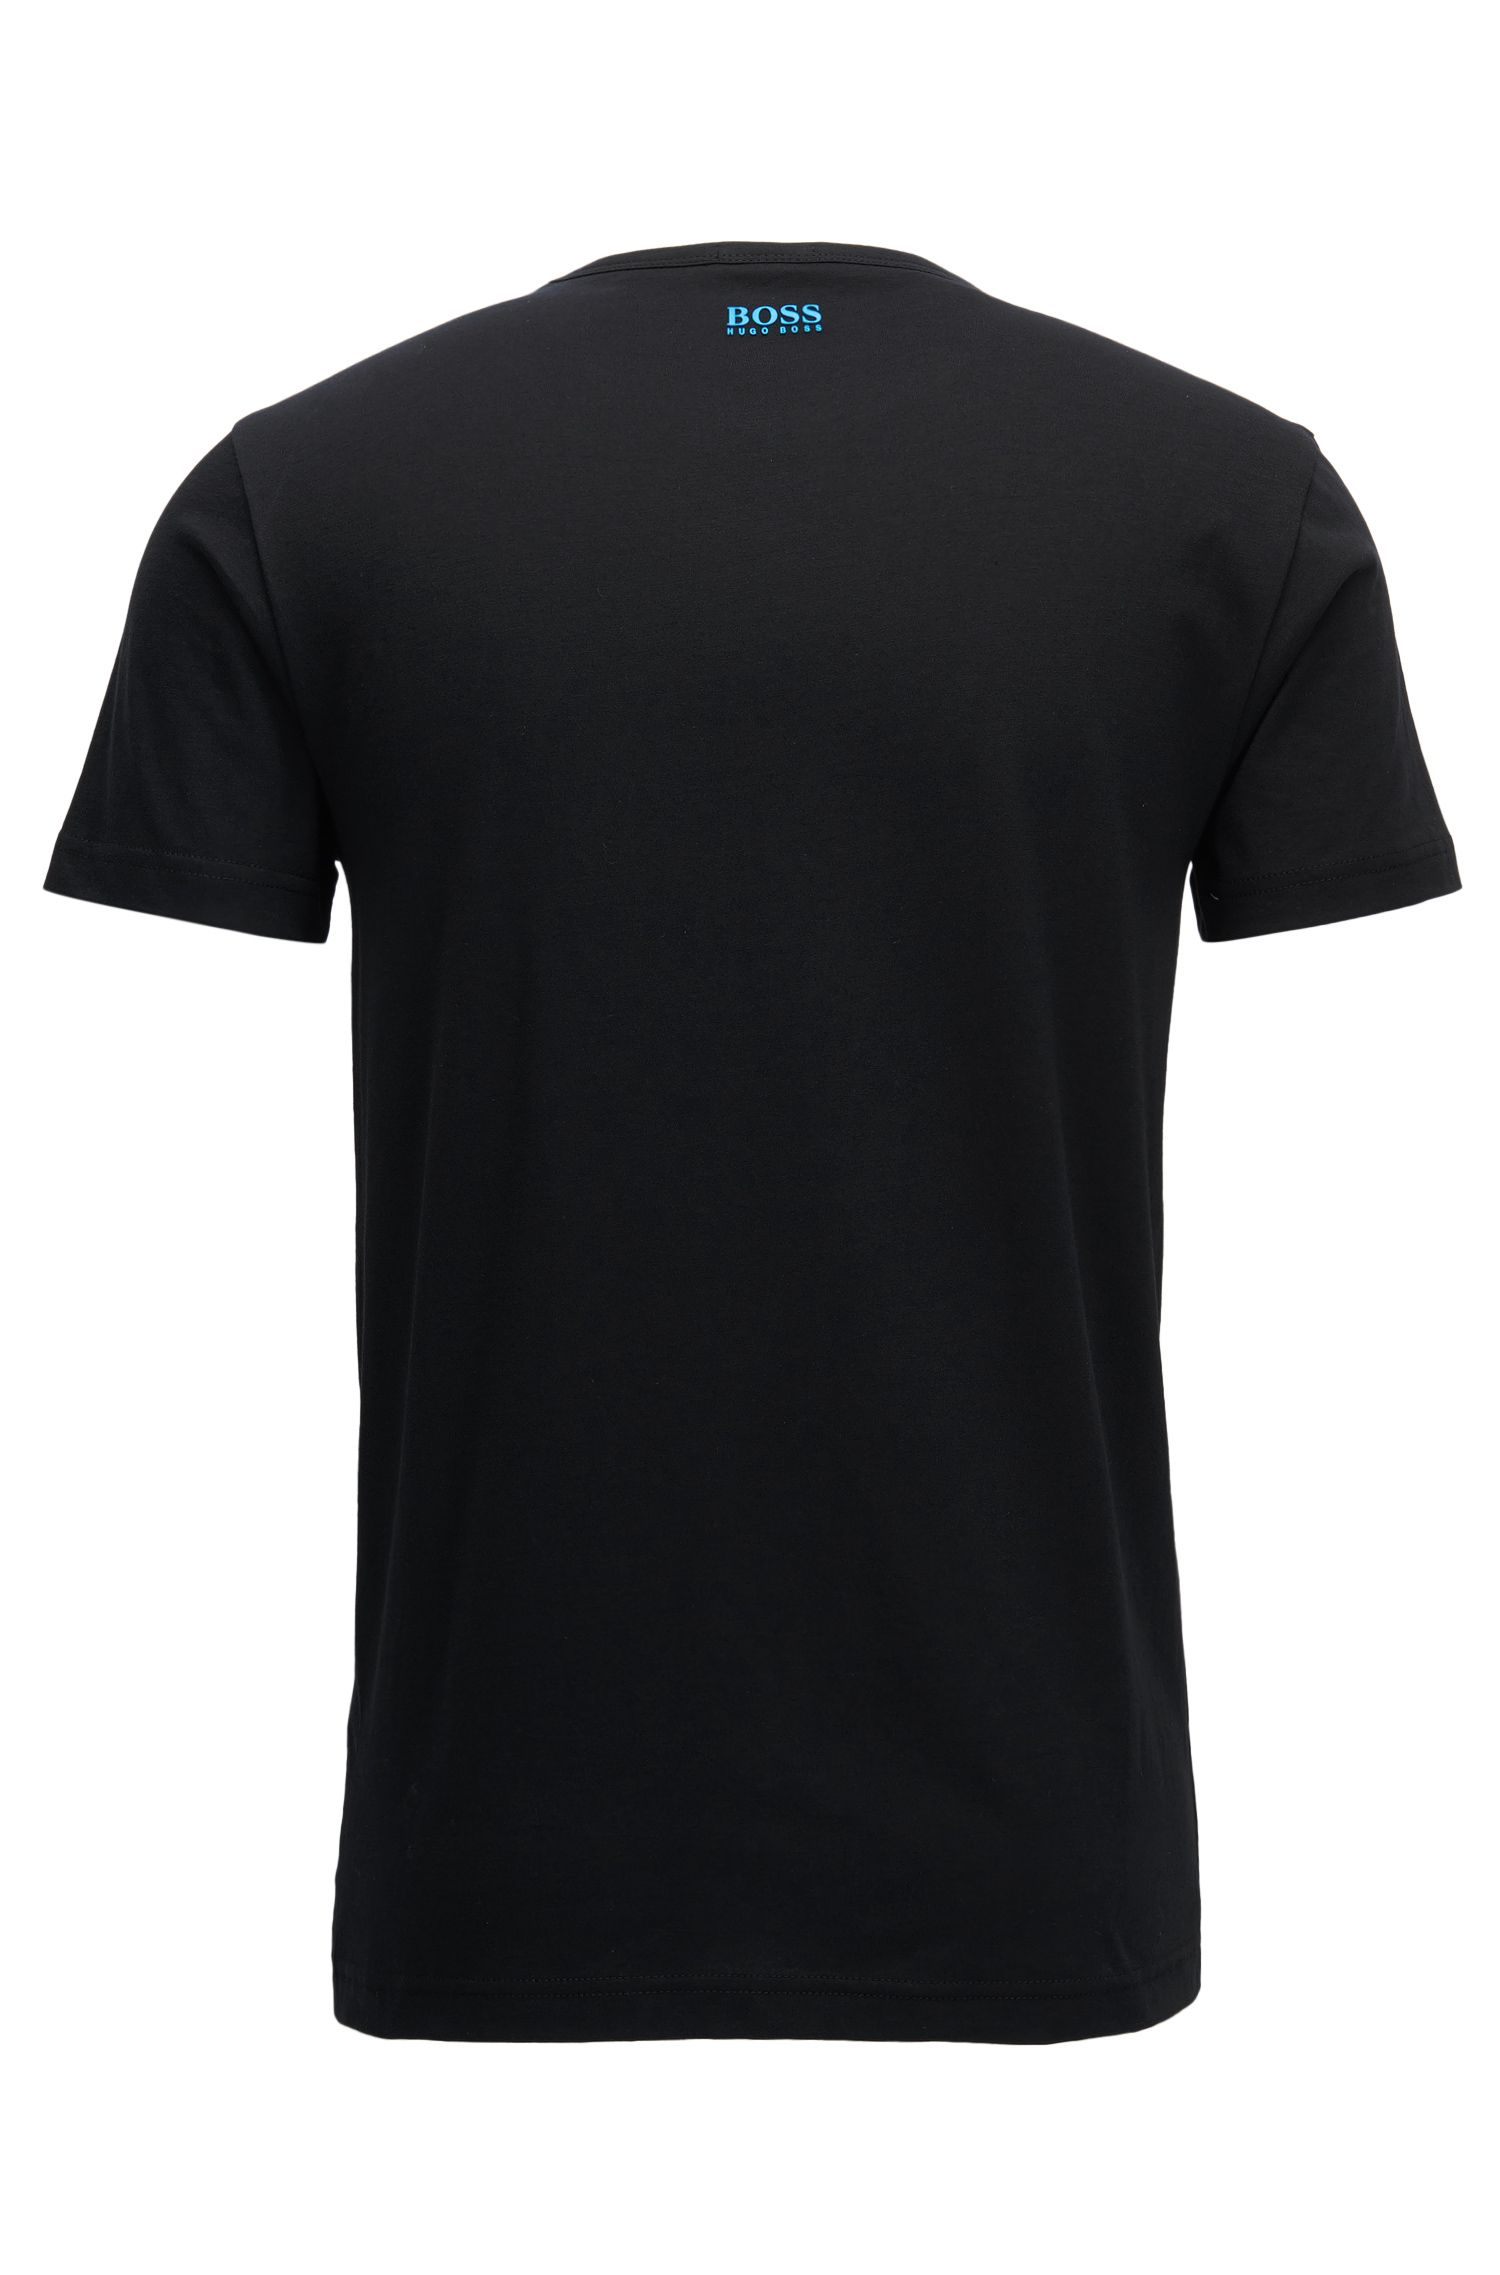 Cotton Graphic T-Shirt | Tee, Black